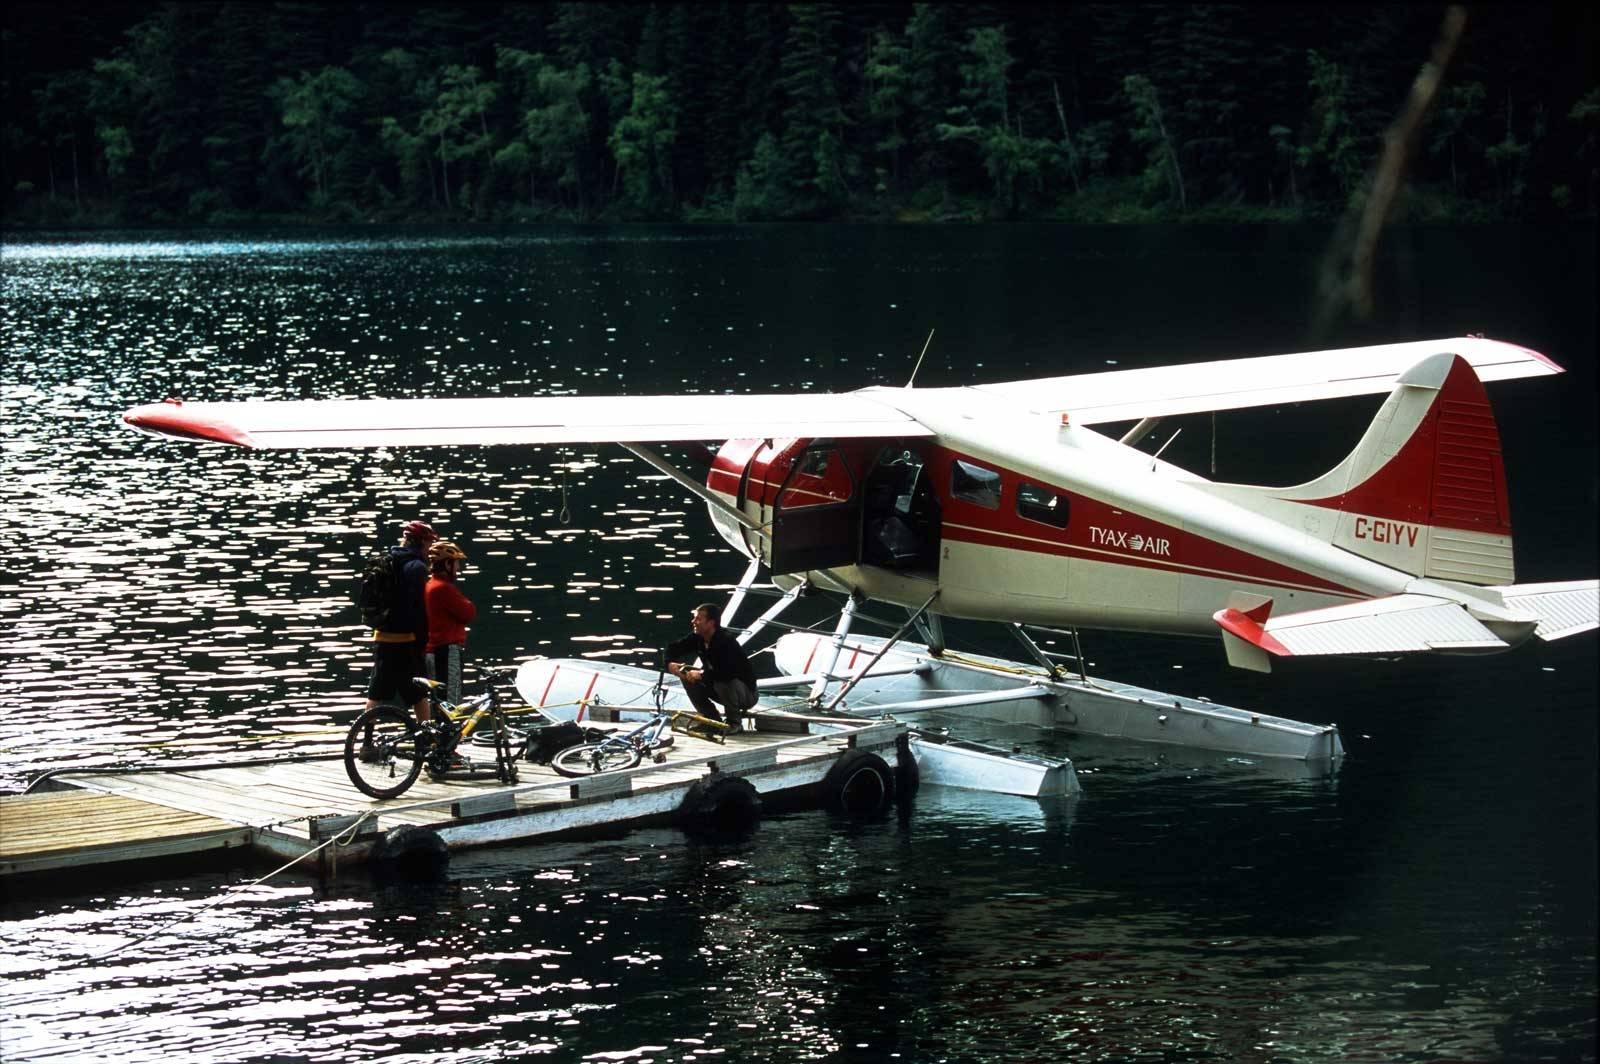 Stisykling-guide-British-Columbia-Chilcotin-Mountains-2